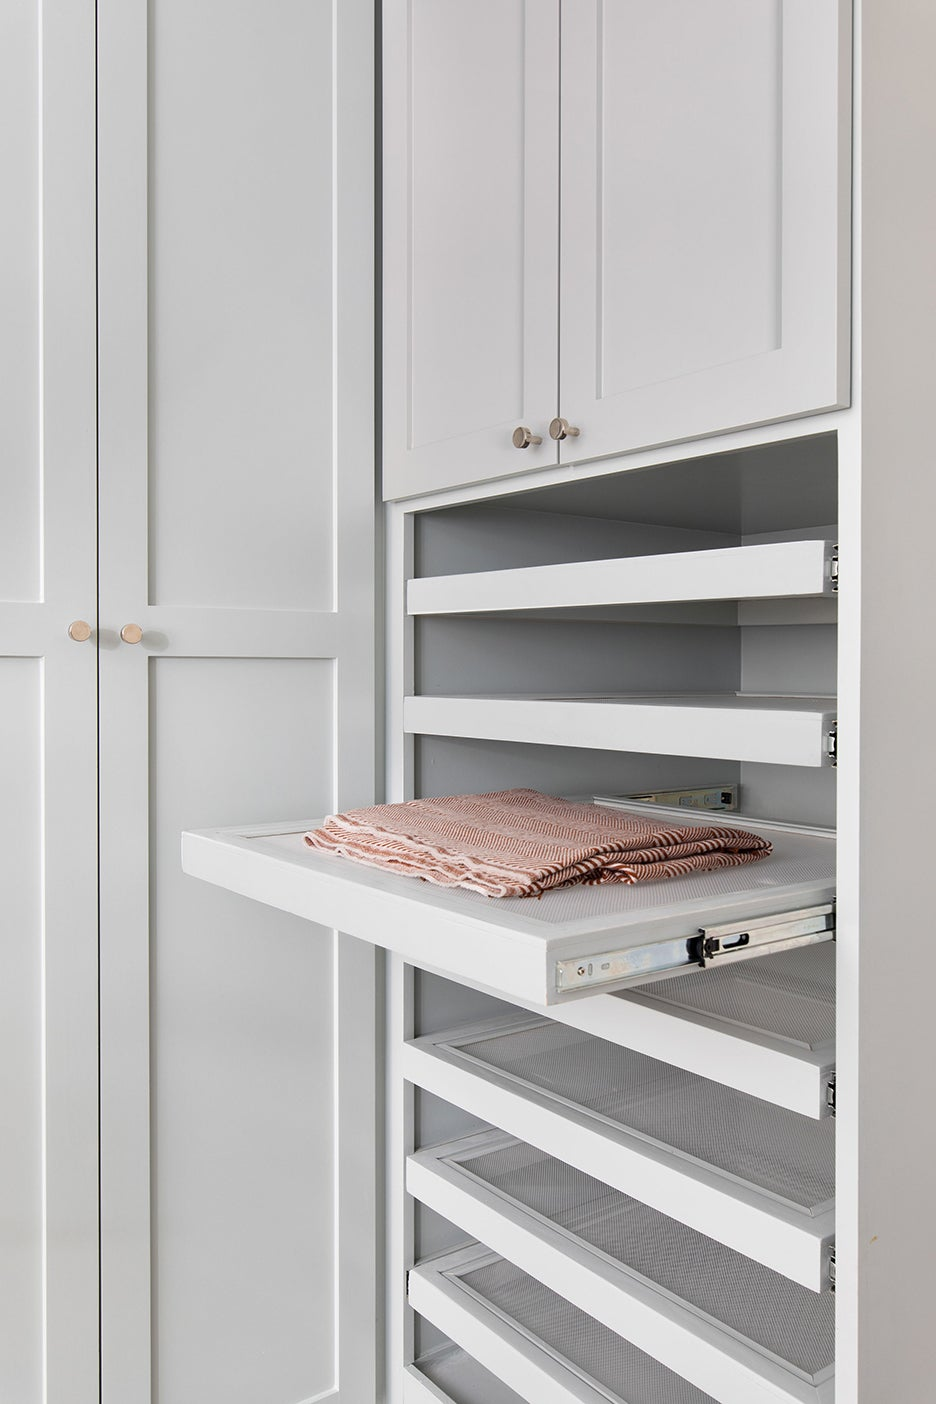 rag on a shelf